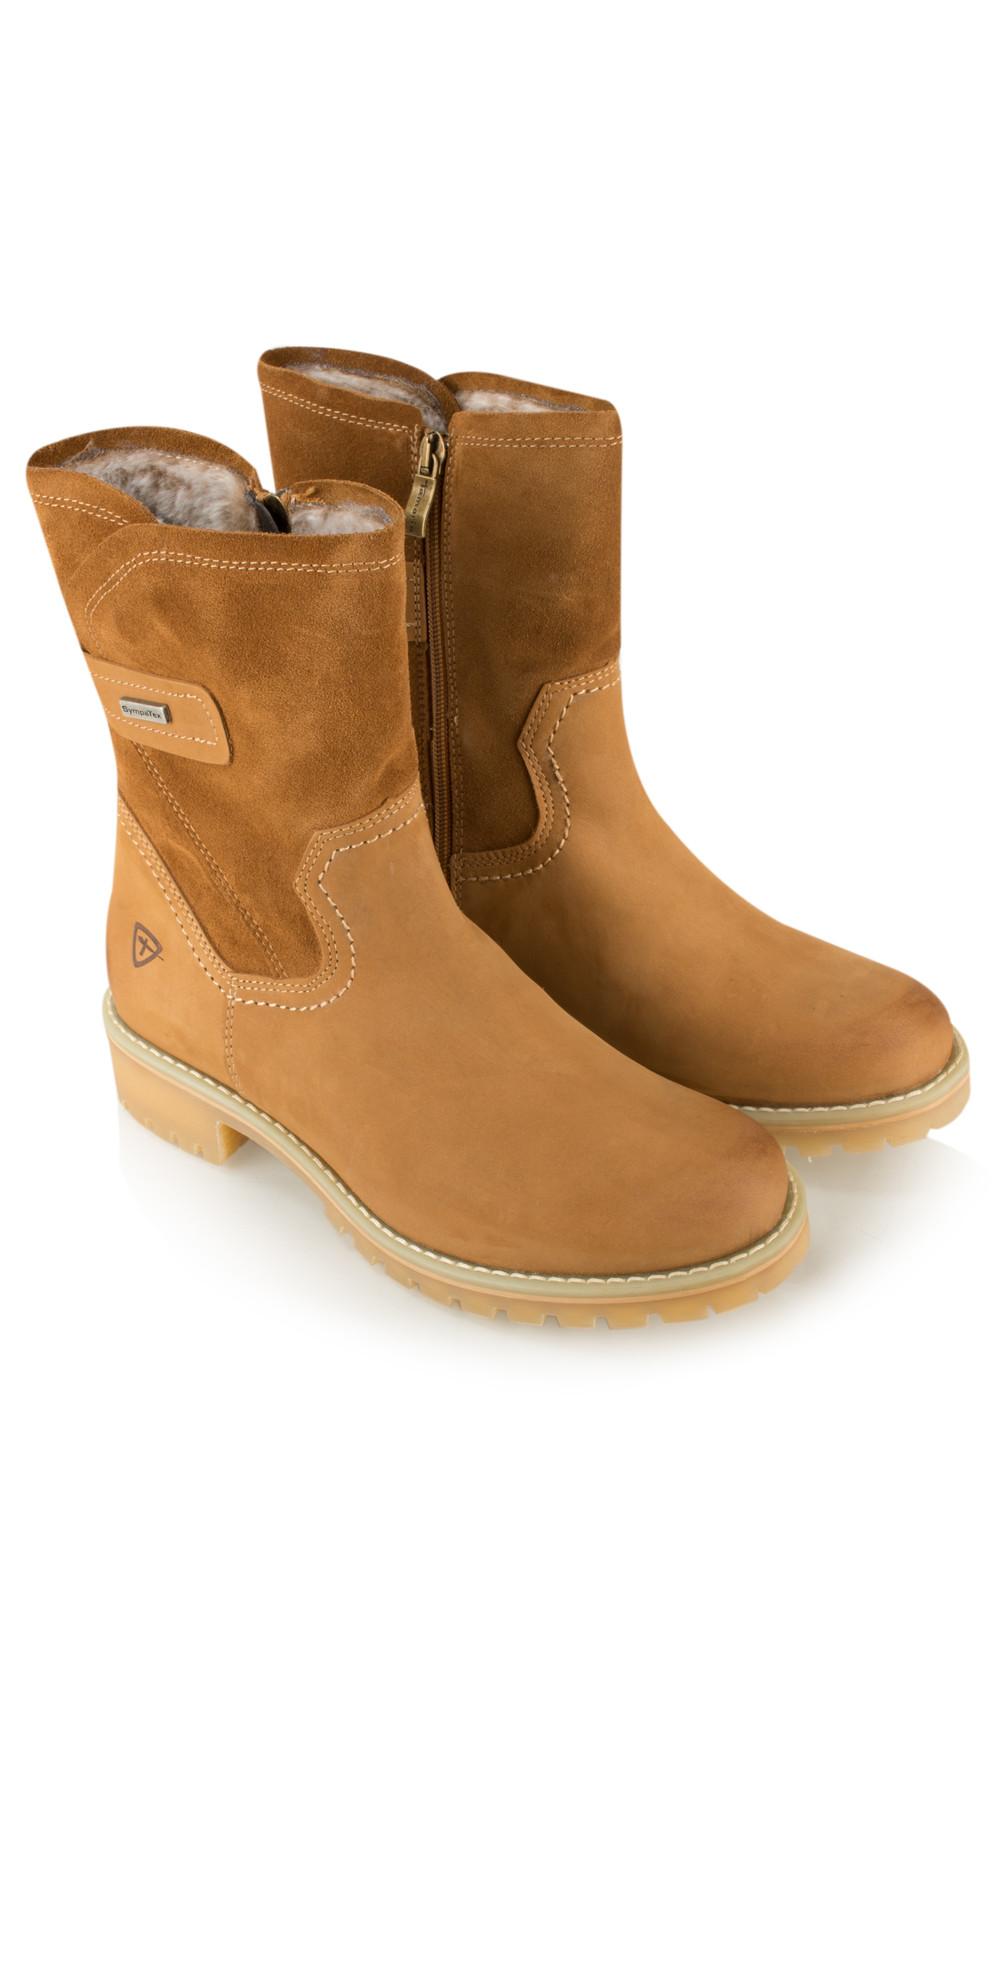 tamaris leather sympatex calf boot in cognac. Black Bedroom Furniture Sets. Home Design Ideas